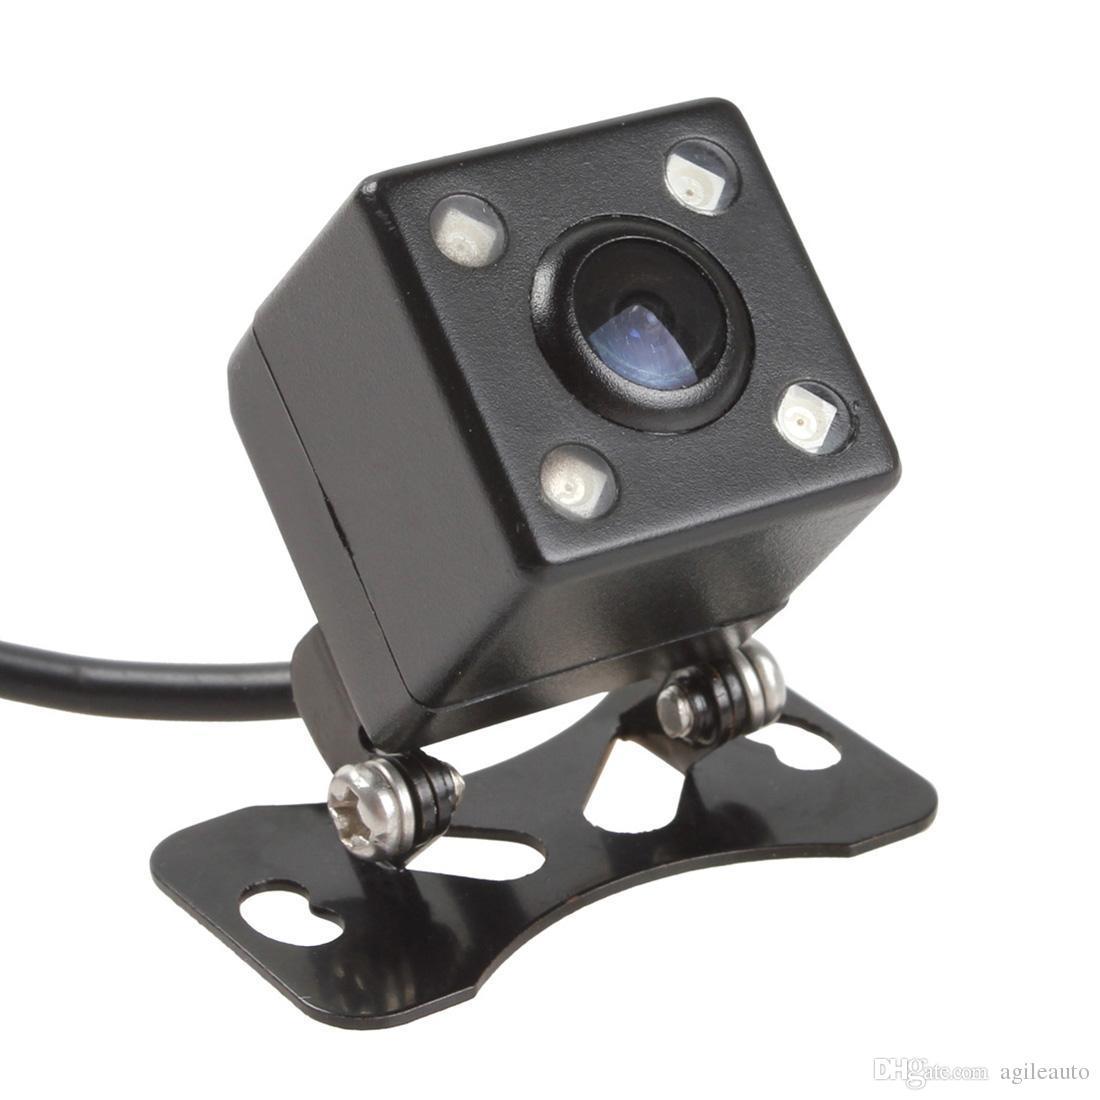 7 polegadas TFT LCD cor 2 entrada de vídeo Car Rear View Headrest Monitor DVD VCR Monitor + Night Vision Camera Rear View CMO_335